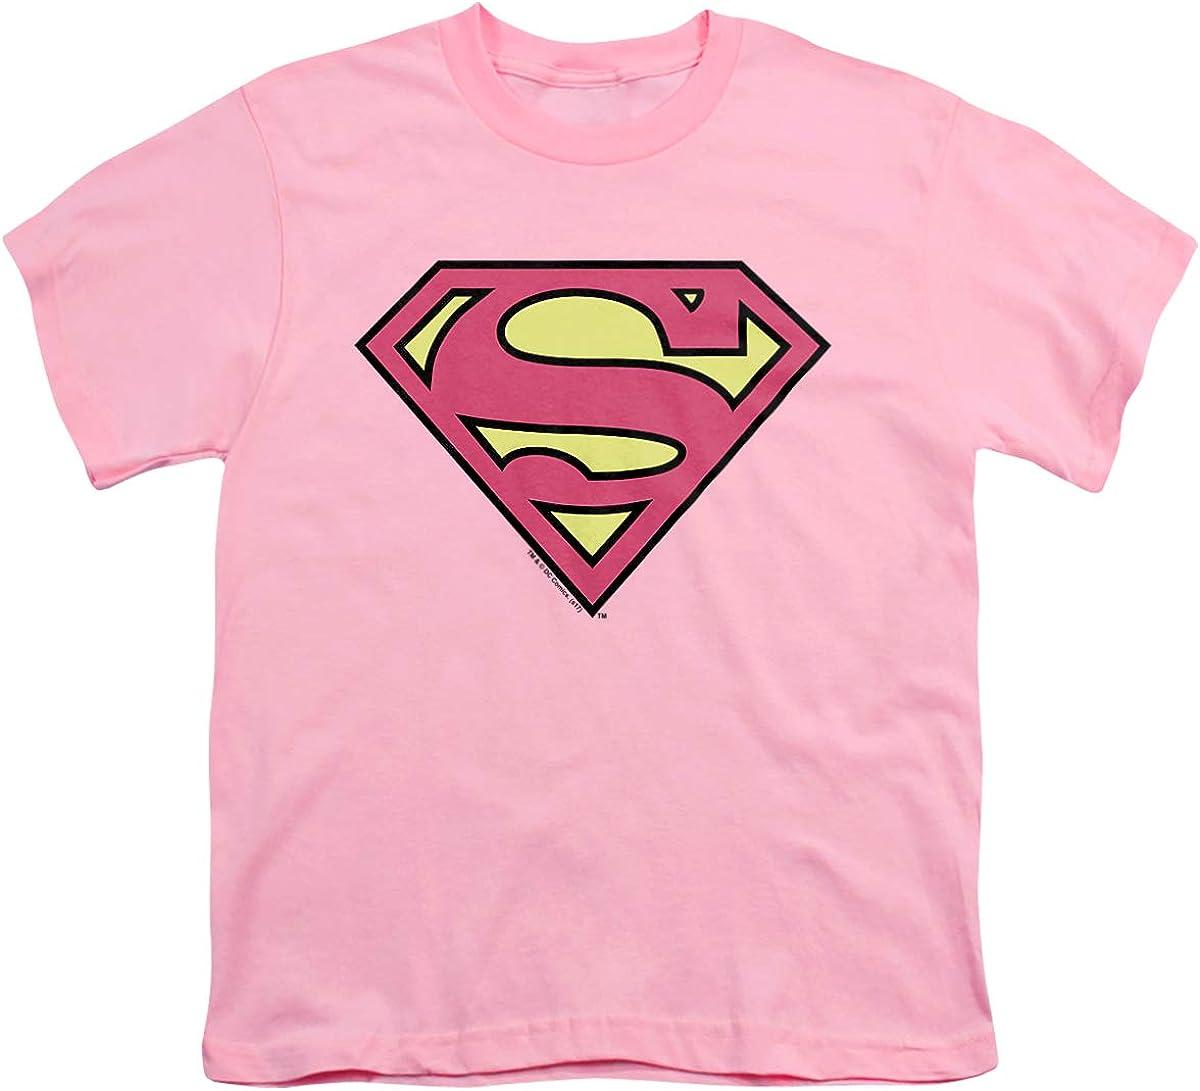 DC Superman Classic Logo Unisex Youth T Shirt, Pink, X-Large